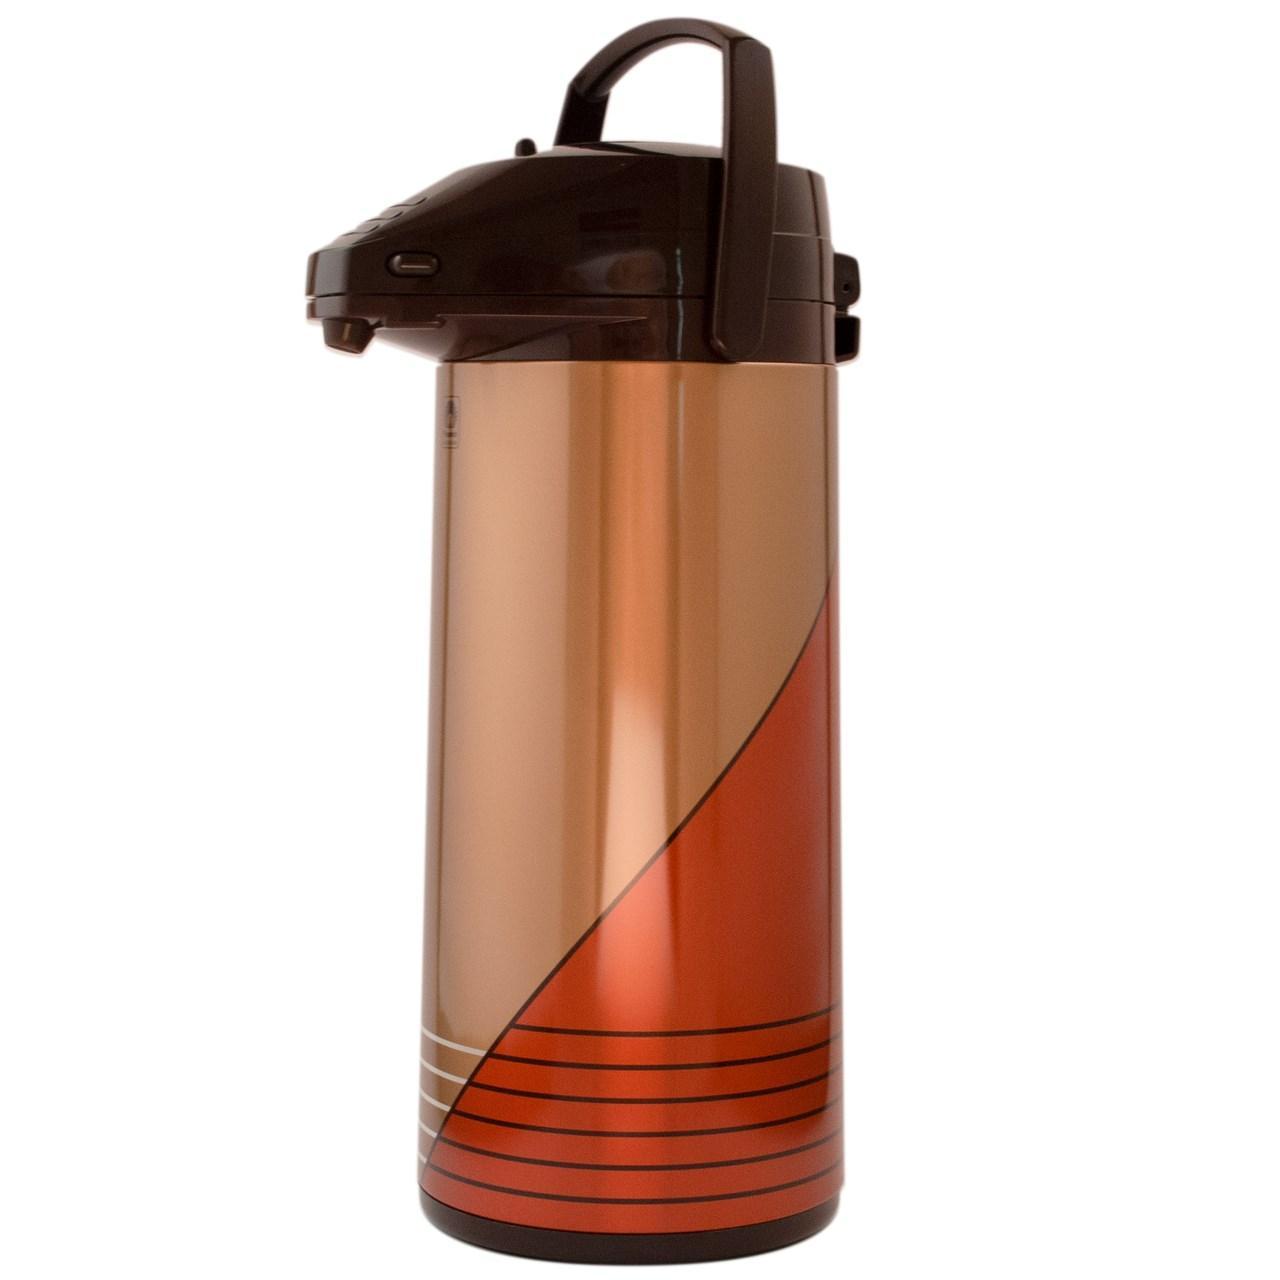 عکس فلاسک پیکاک مدل Air Pot ظرفیت 2.5 لیتر